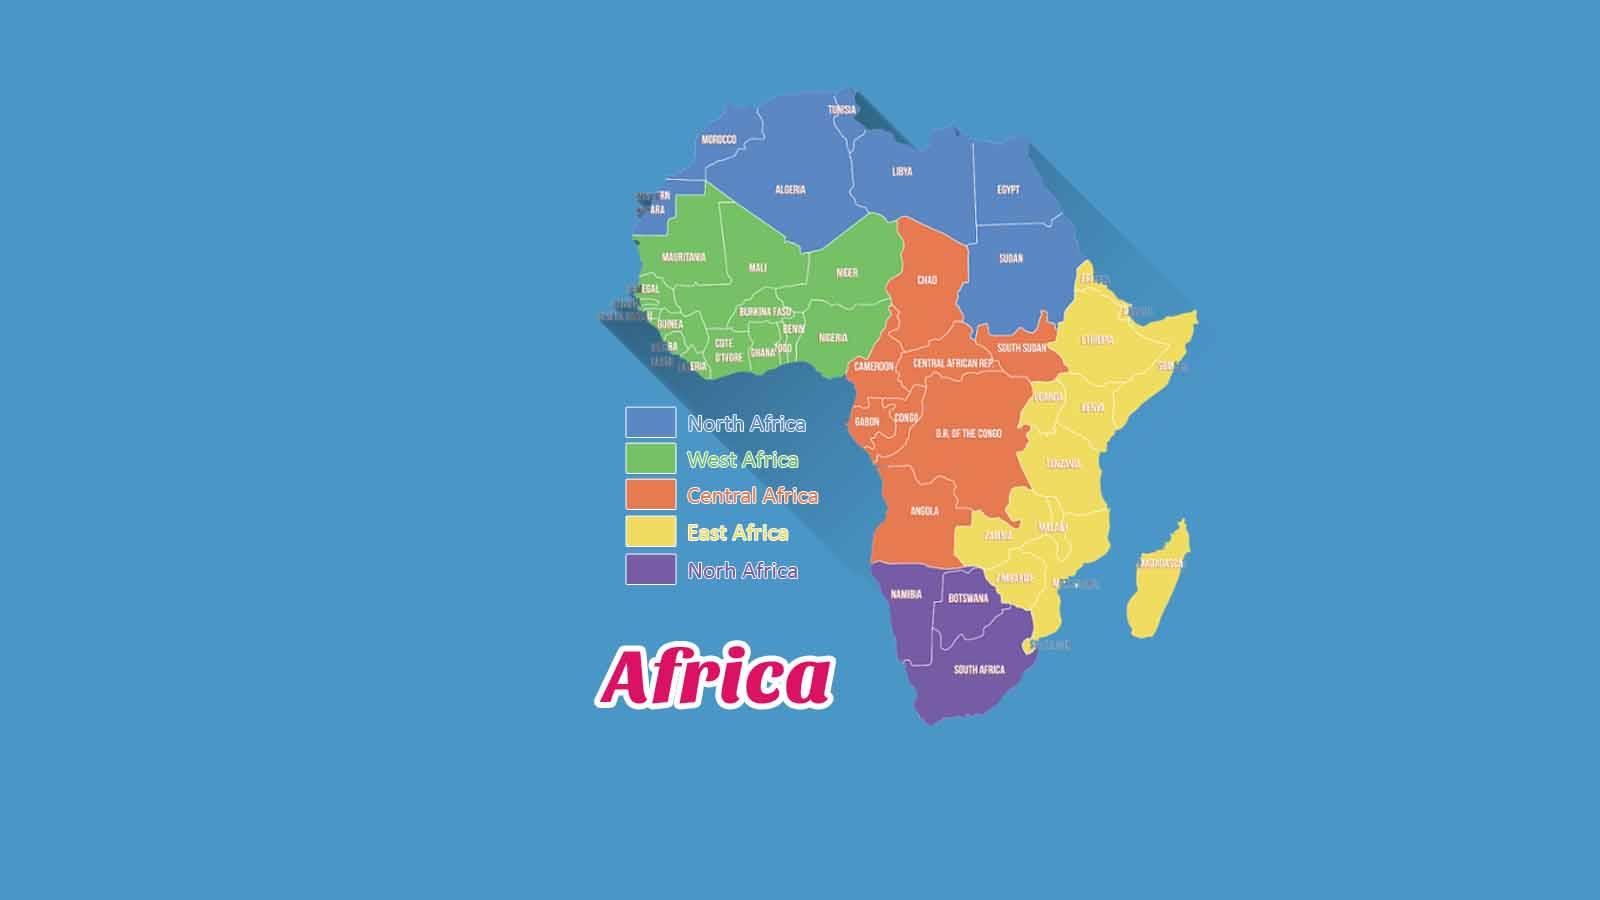 Kosakata Bahasa Inggris Negara Di Benua Afrika Disertai Gambar, Audio Dan Pronunciation